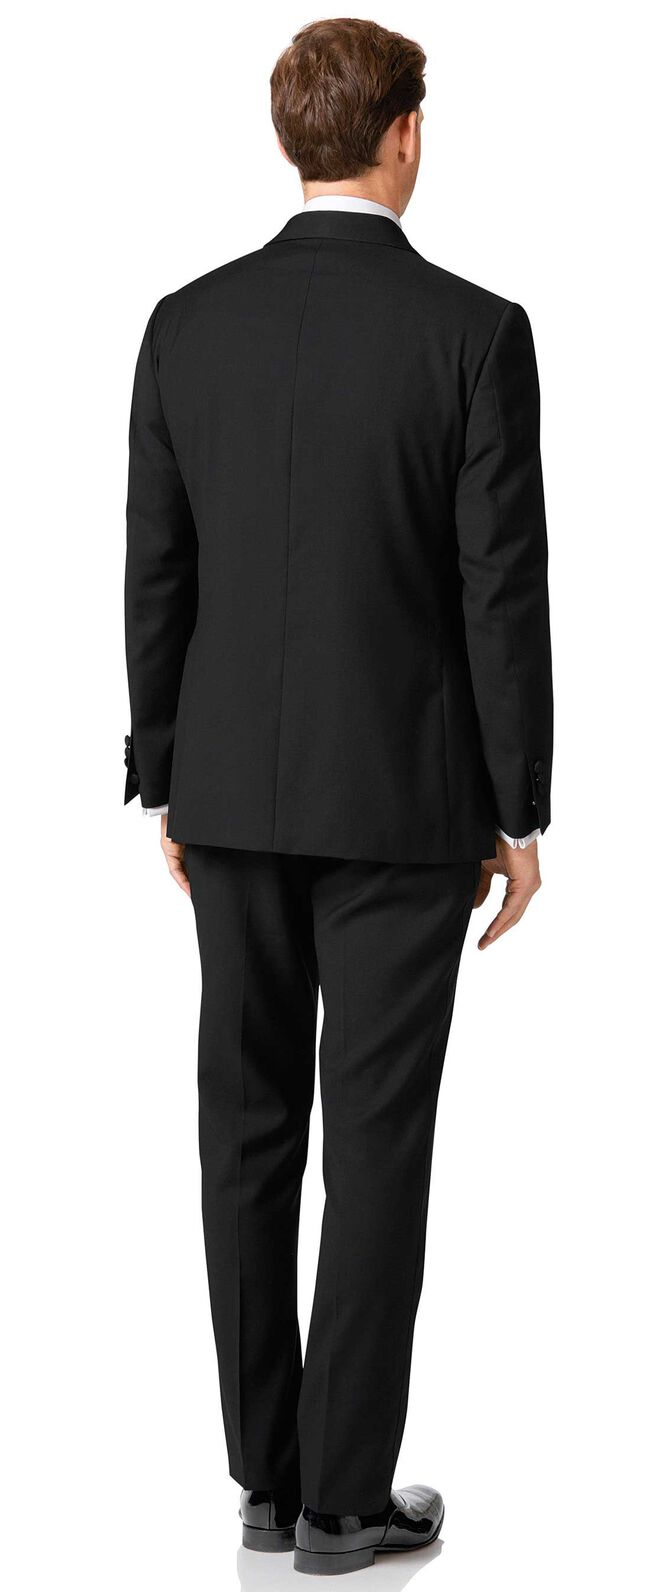 Black classic fit shawl collar dinner suit